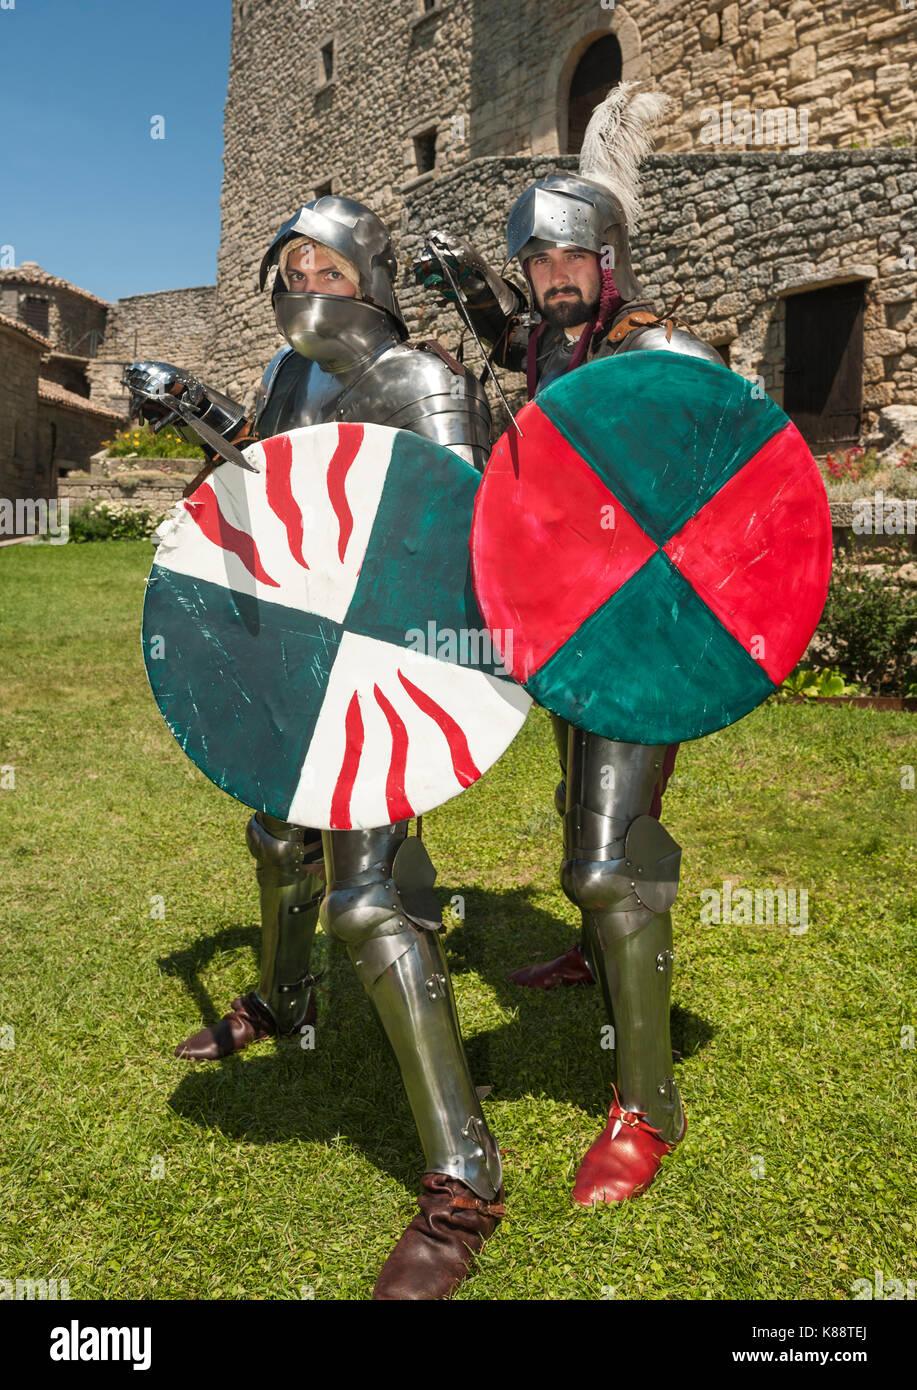 Knight Armour Stock Photos & Knight Armour Stock Images ...